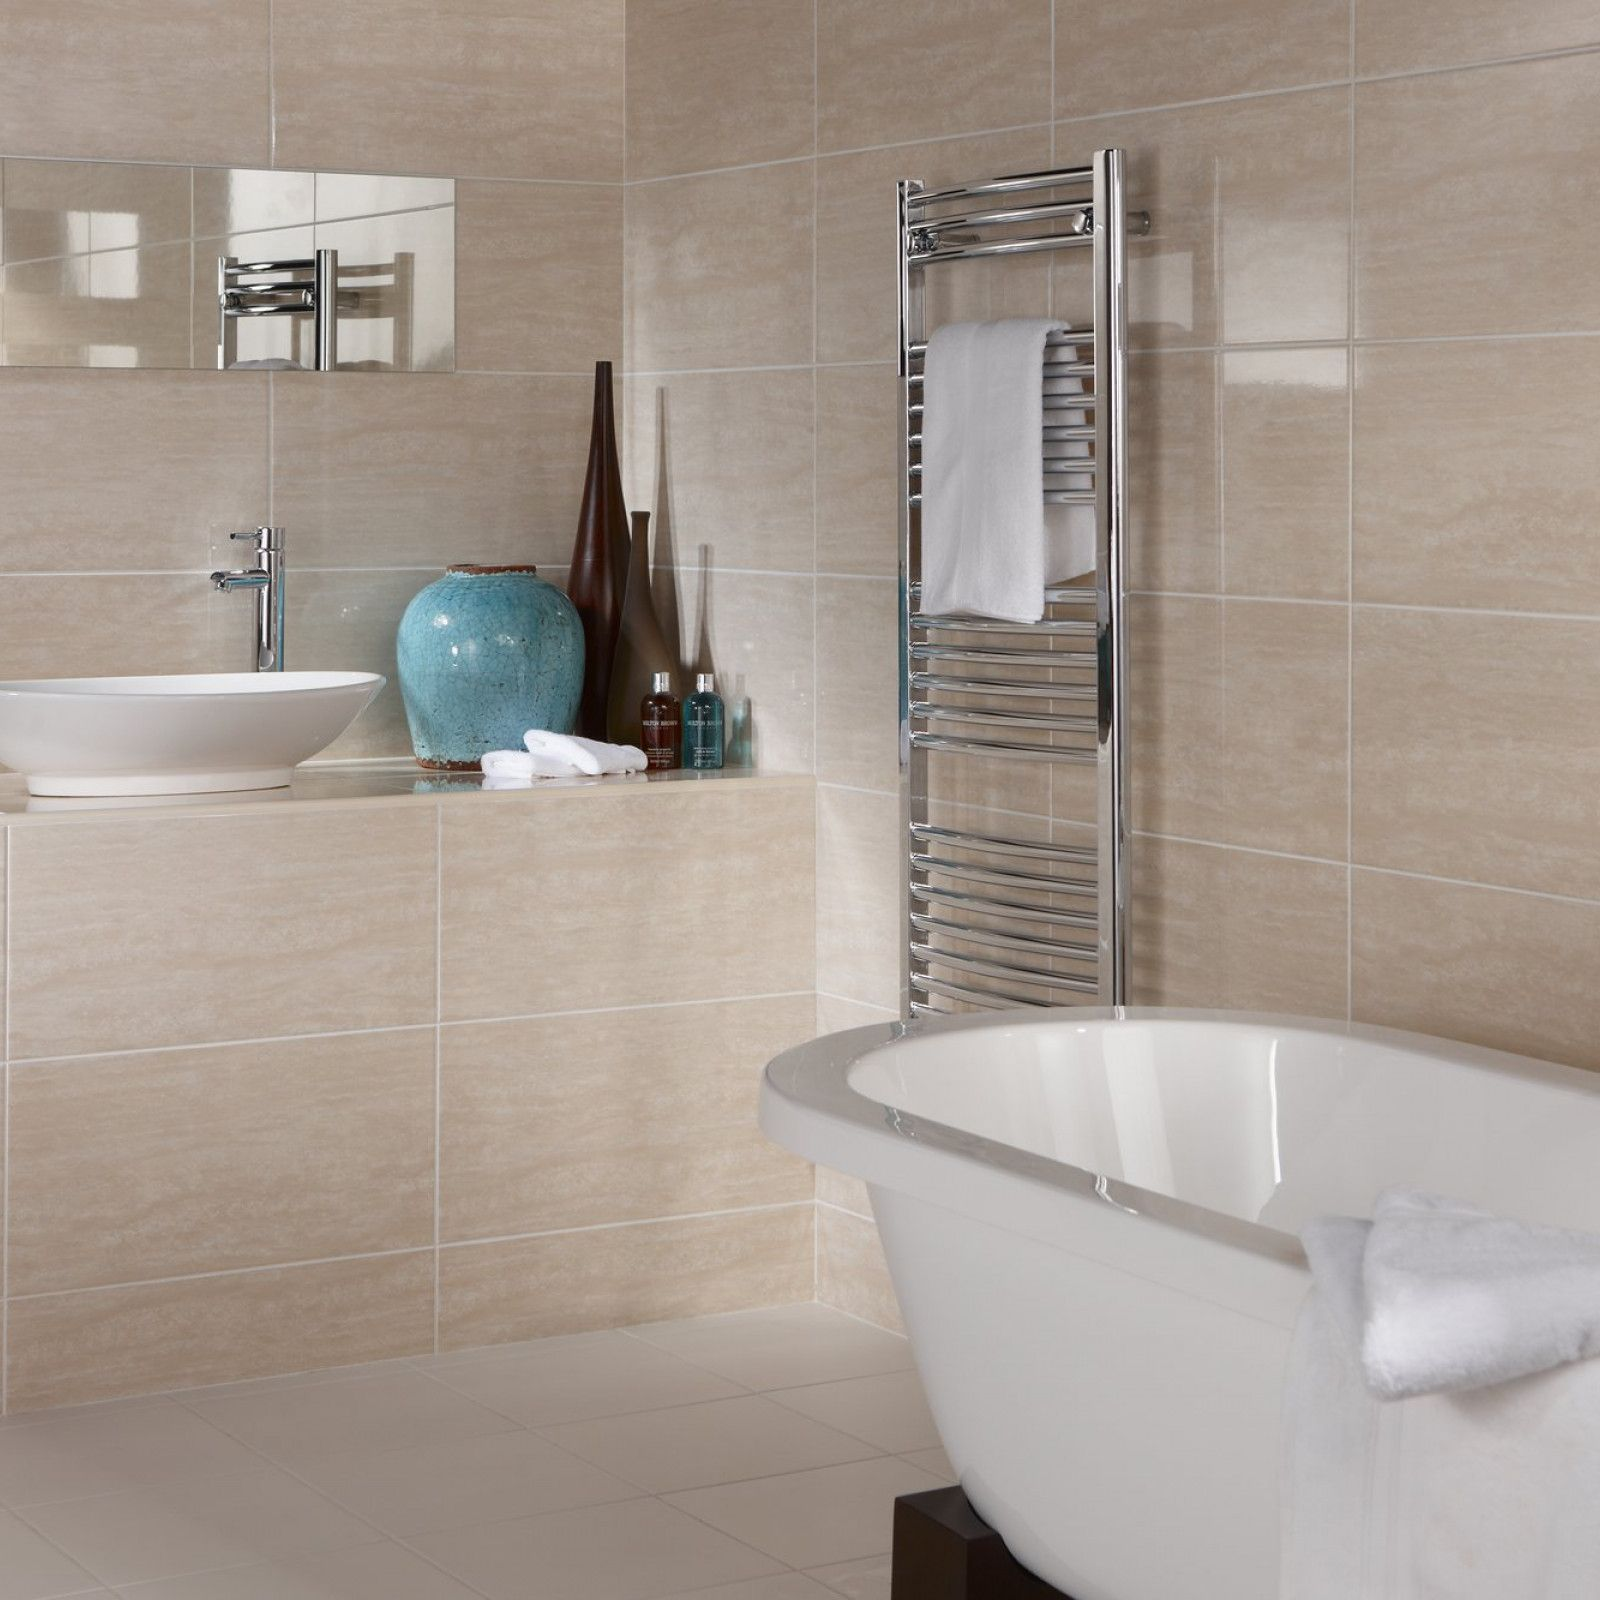 British Ceramic Tile Small Bathroom Tiles Bathroom Wall Tile Cream Bathroom